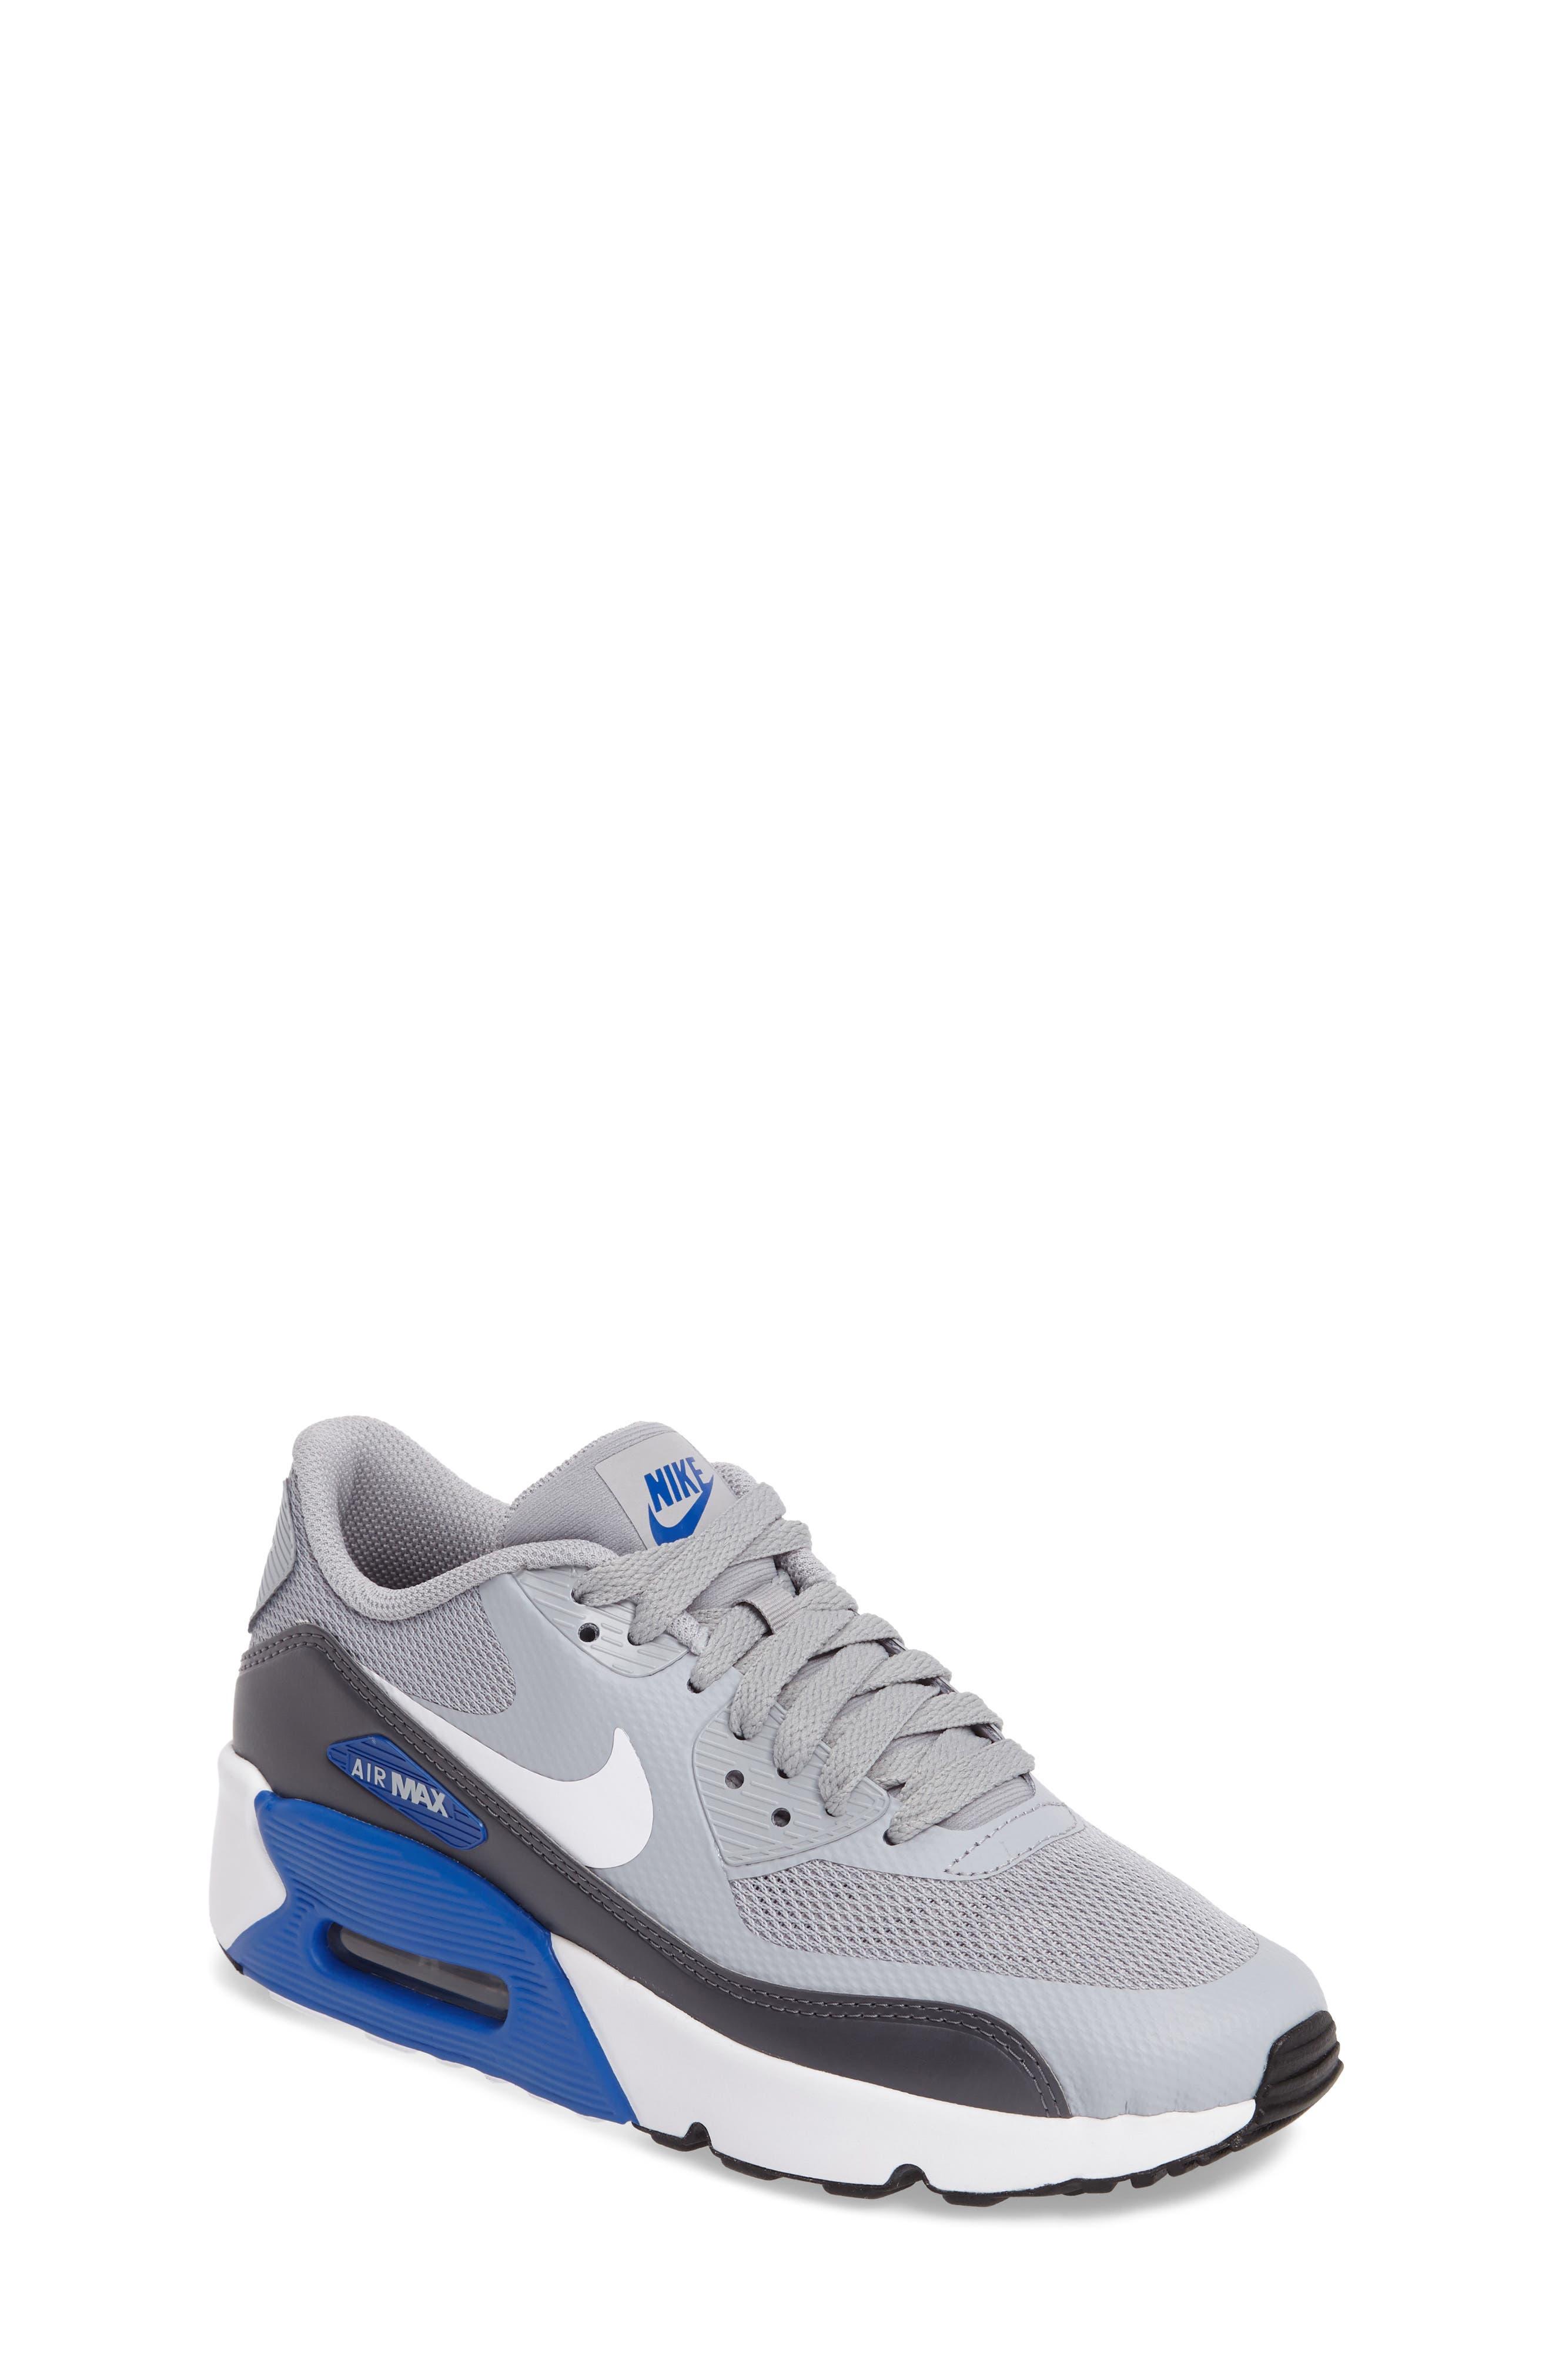 Nike Air Max 90 Ultra 2.0 GS Sneaker (Big Kid)